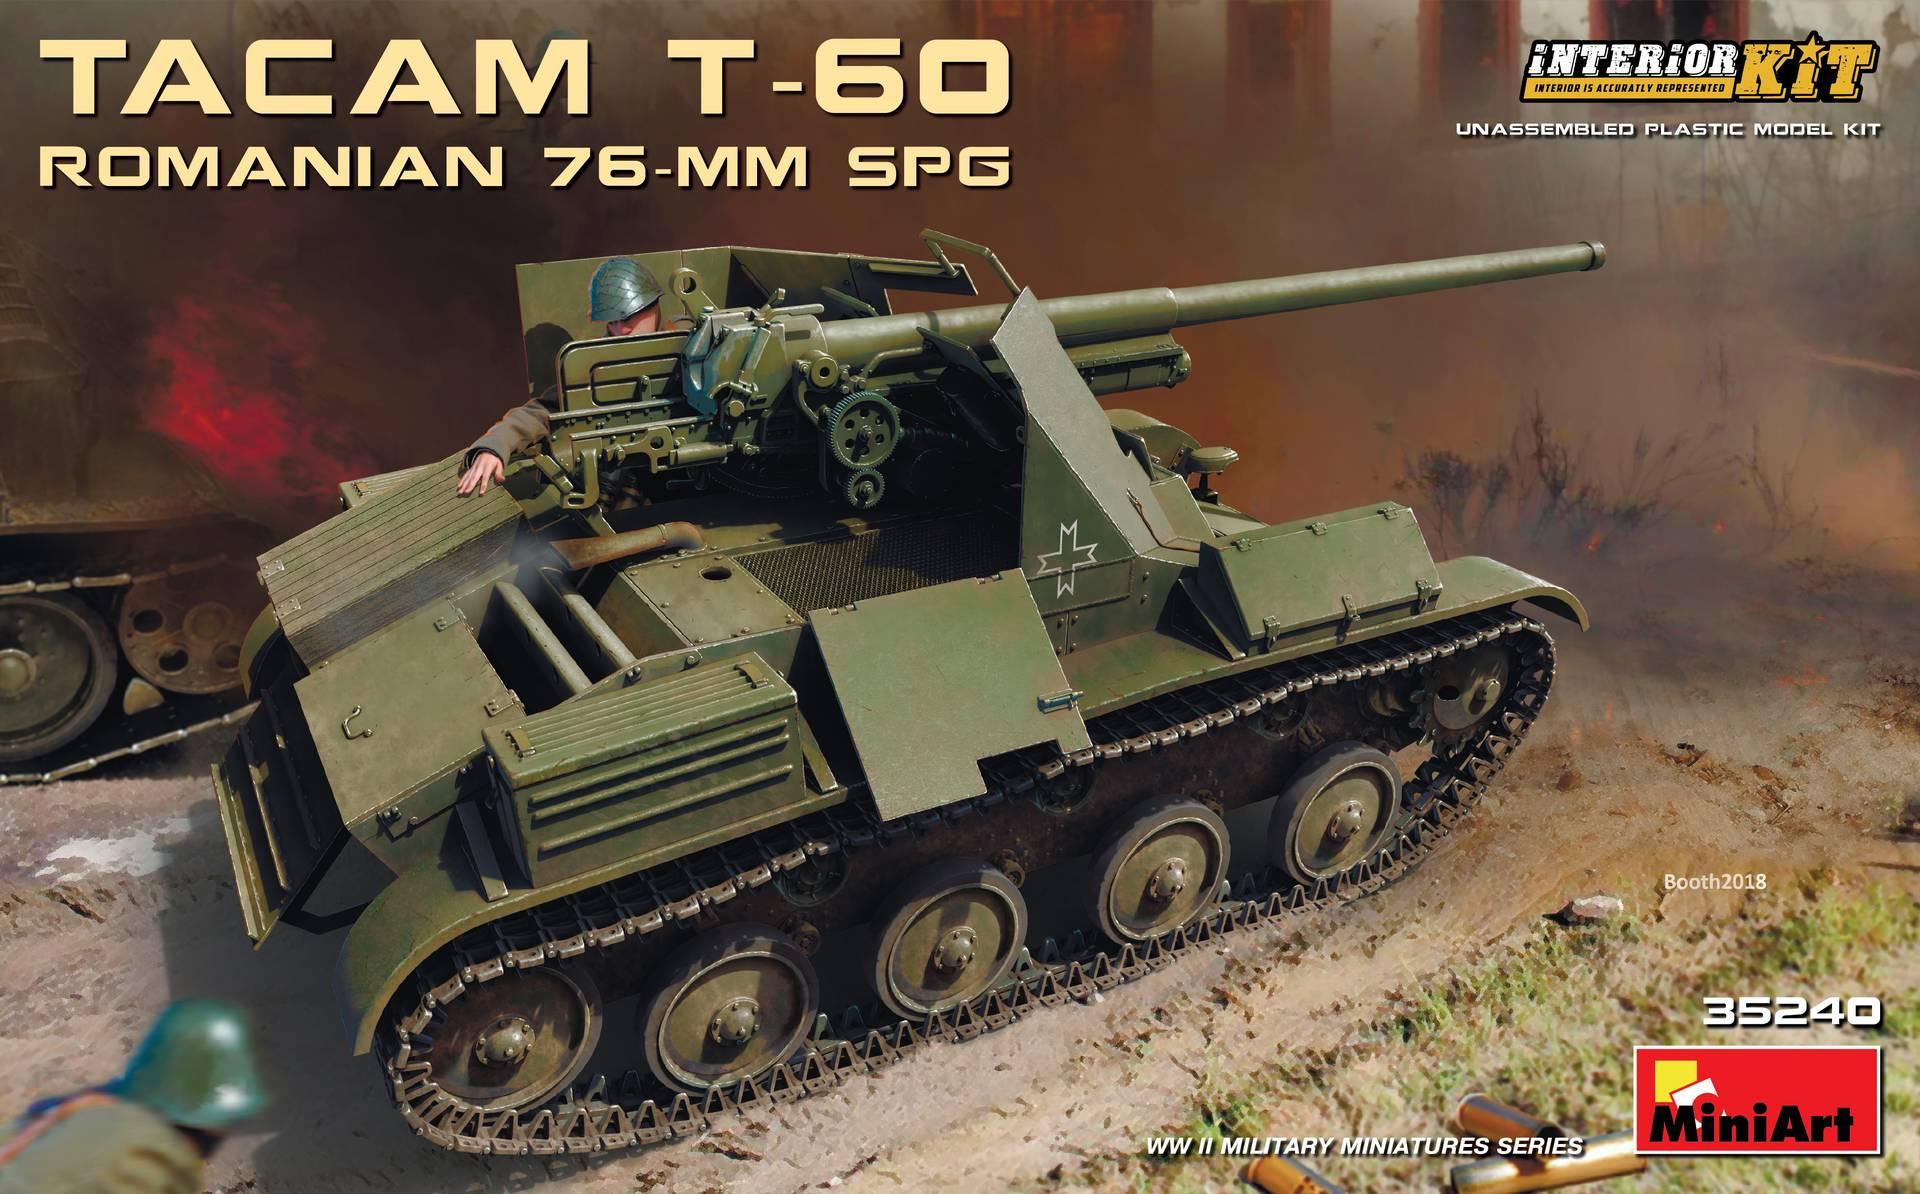 MiniArt-35240-TACAM-T-60-1 Rumänischer 7,62mm Panzerjäger TACAM auf Fahrgestell T-60 von MiniArt 35240